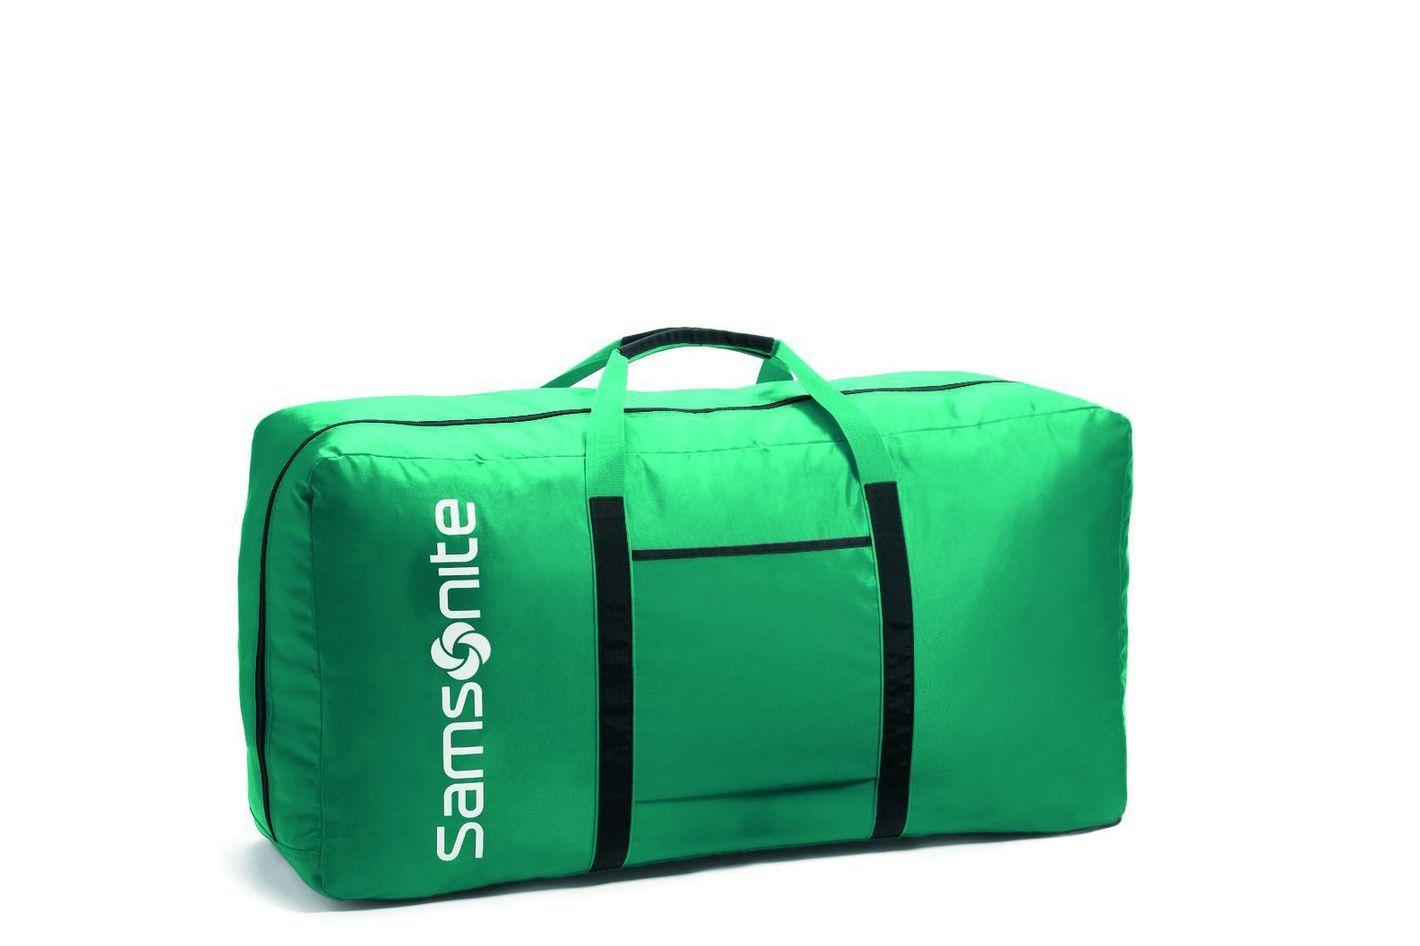 b9051582b8d6 The 15 Best Weekender Bags for Women 2018